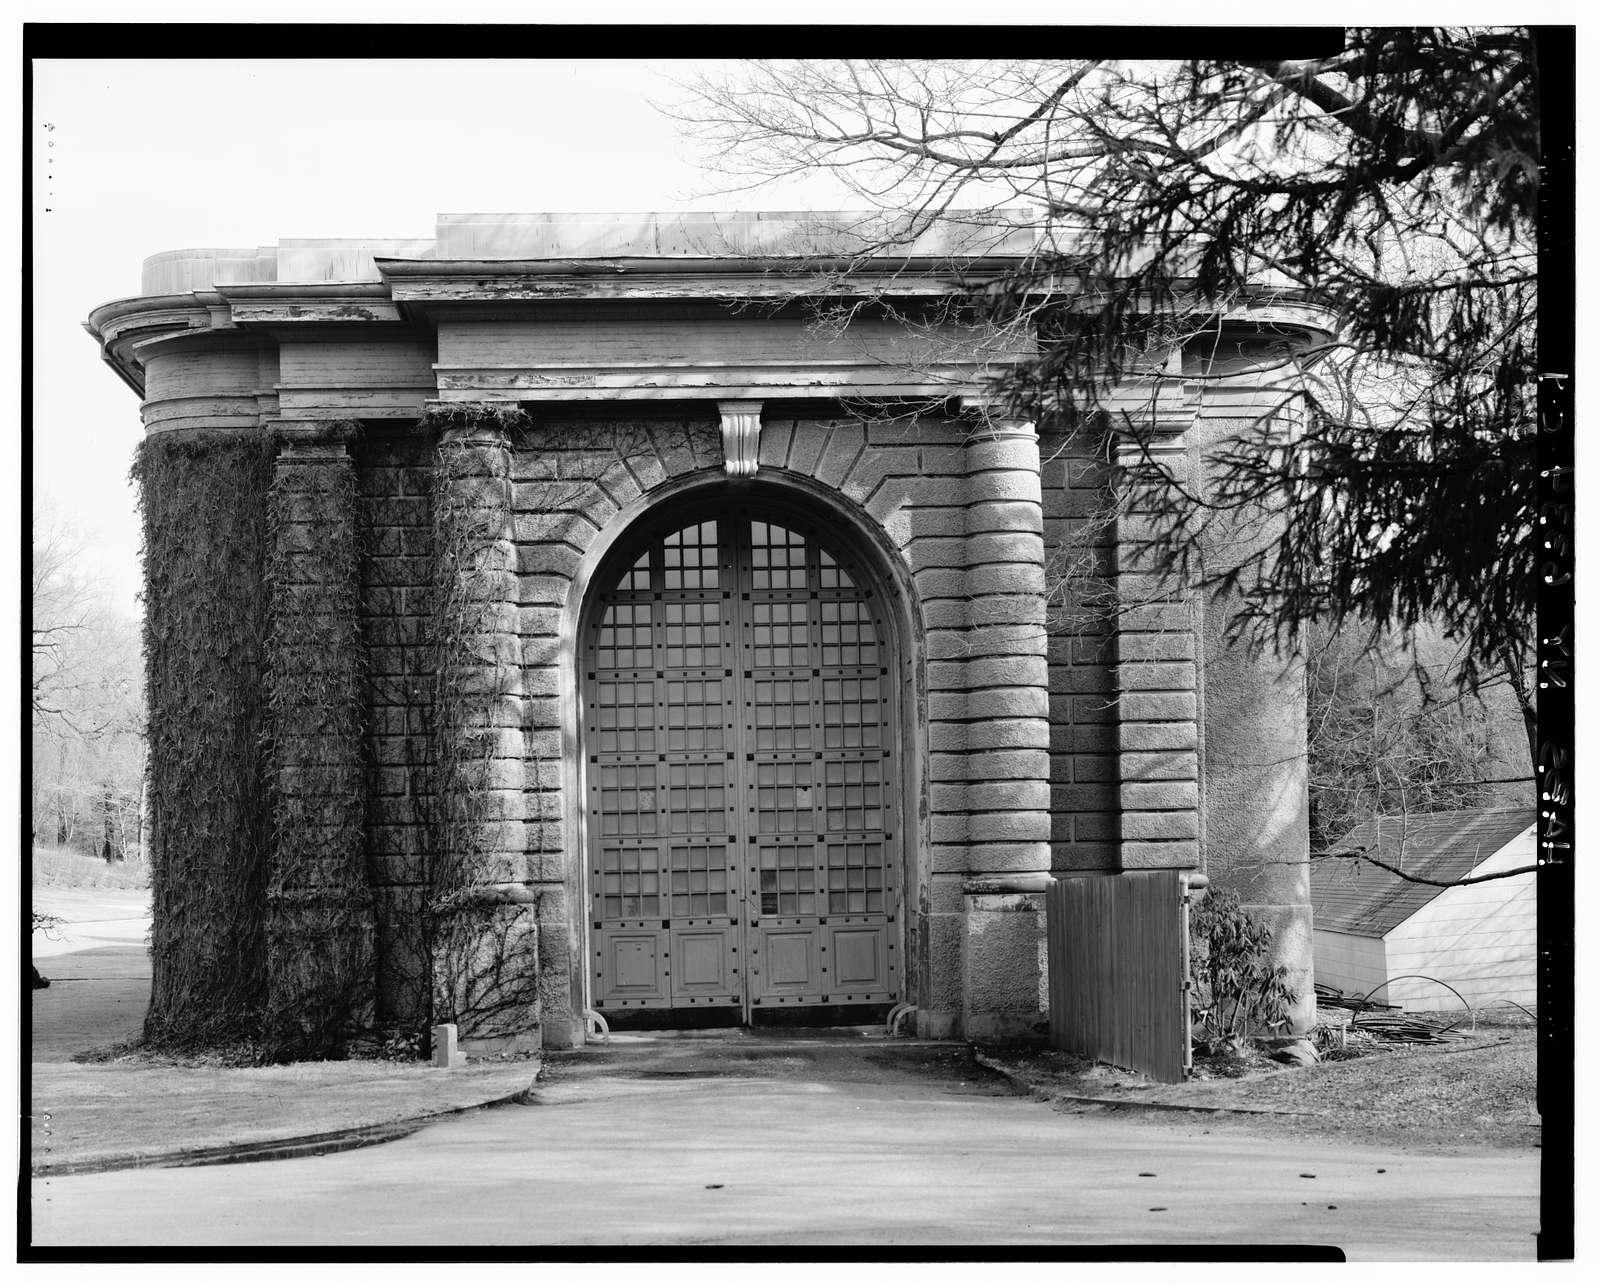 Kykuit, Orangerie & Greenhouse, 200 Lake Road, Pocantico Hills, Westchester County, NY